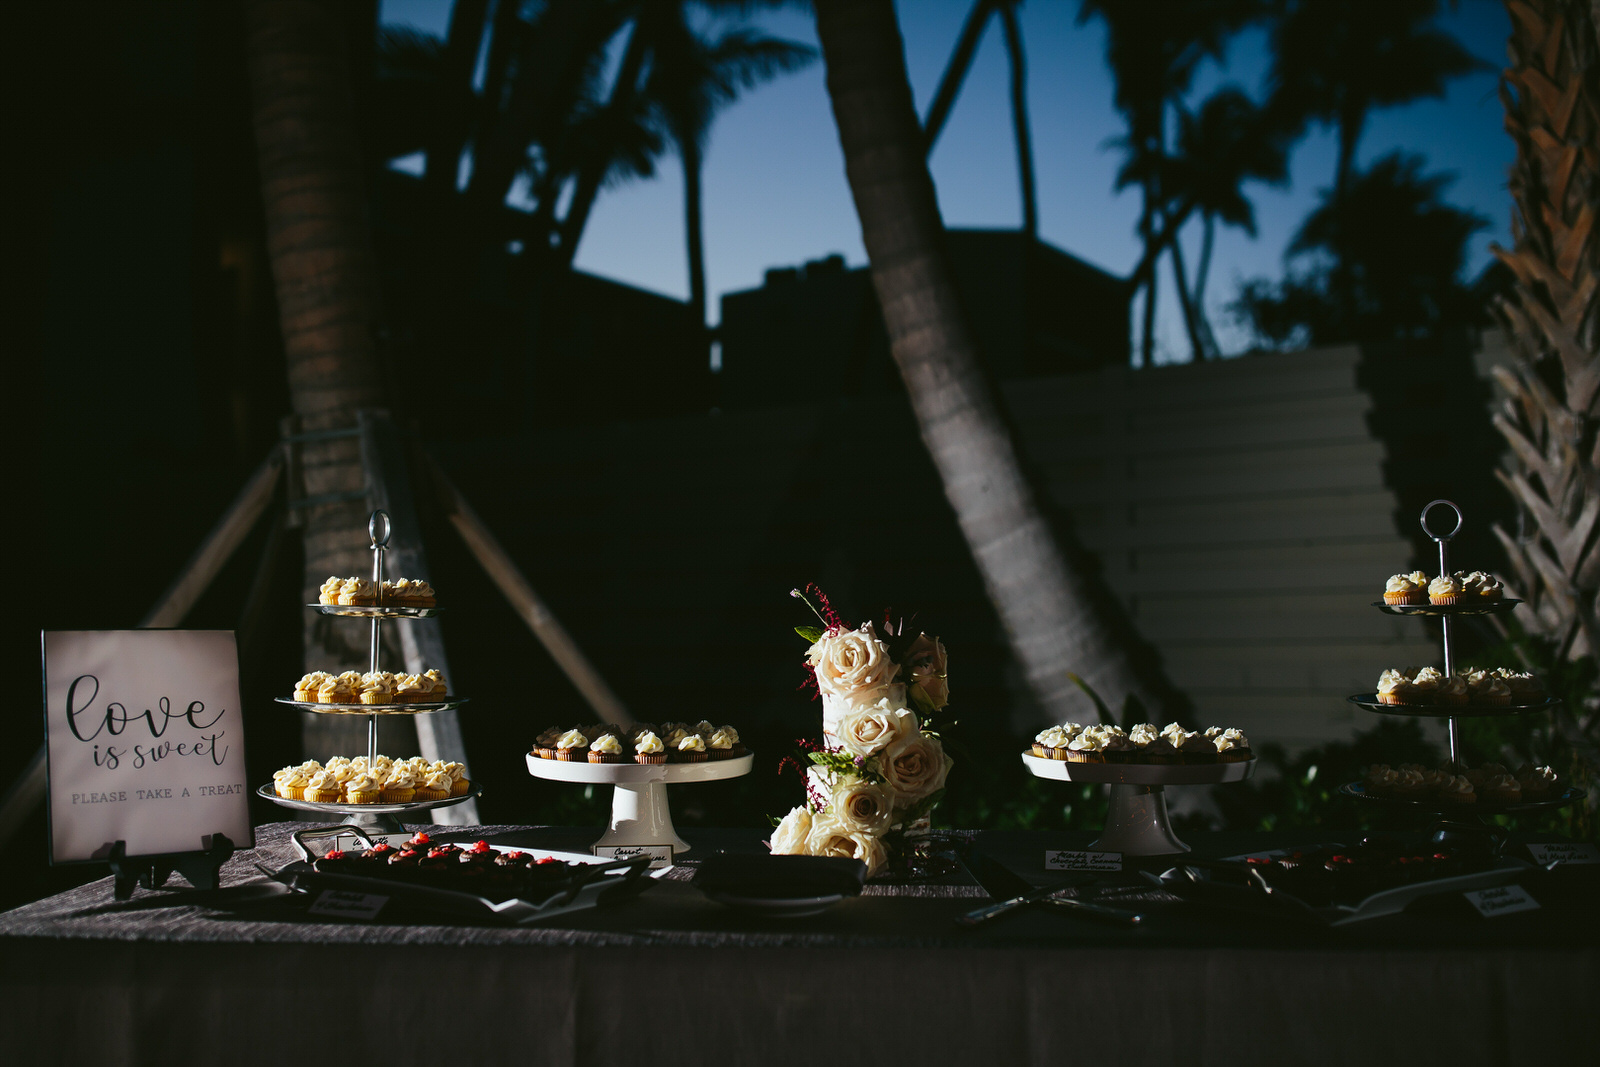 cake_dessert_table_amara_cay_resort_wedding_florida_keys.jpg